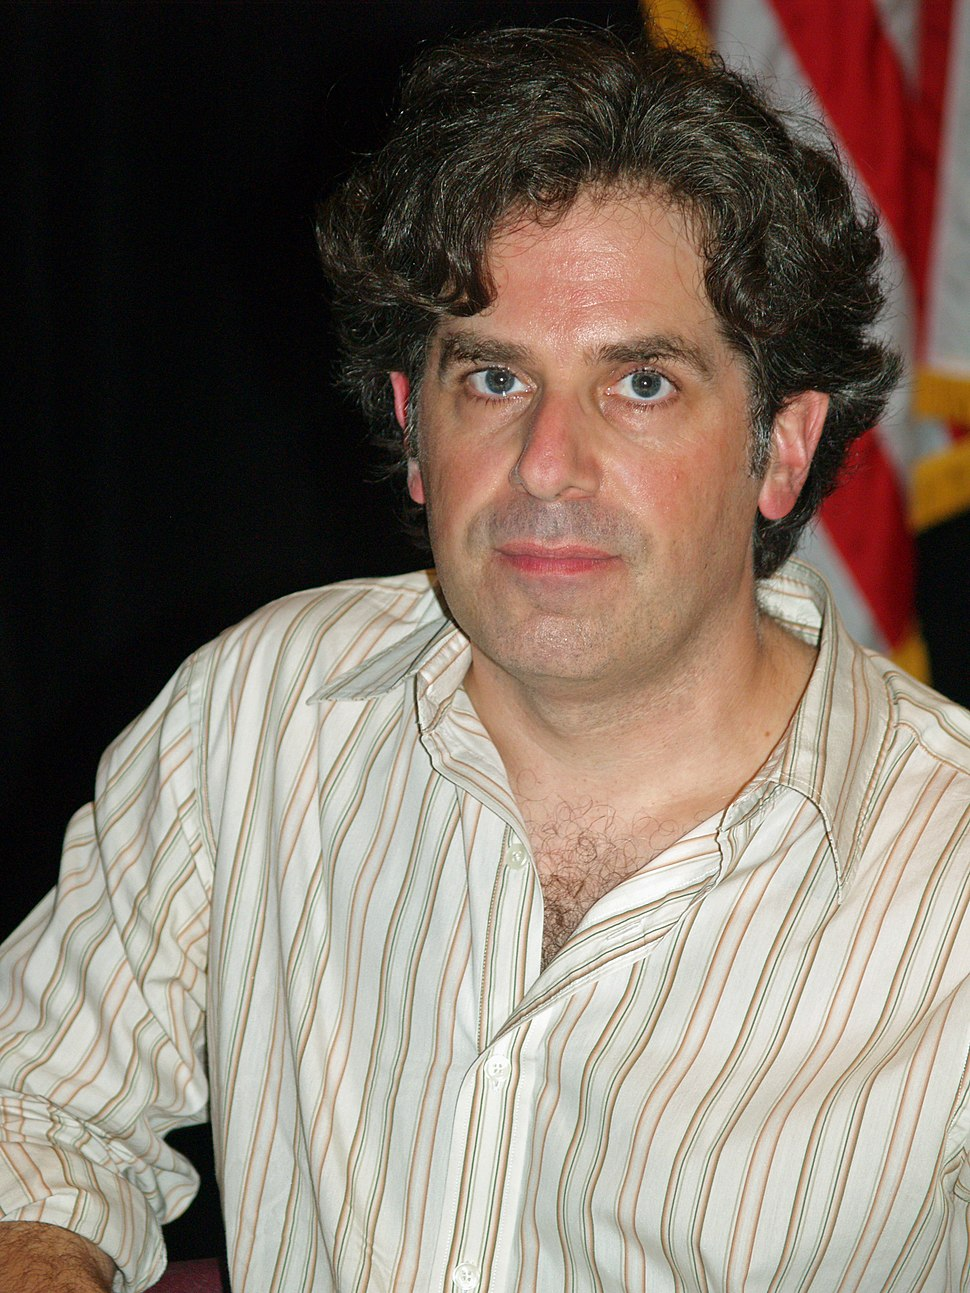 Jonathan Lethem at the Brooklyn Book Festival